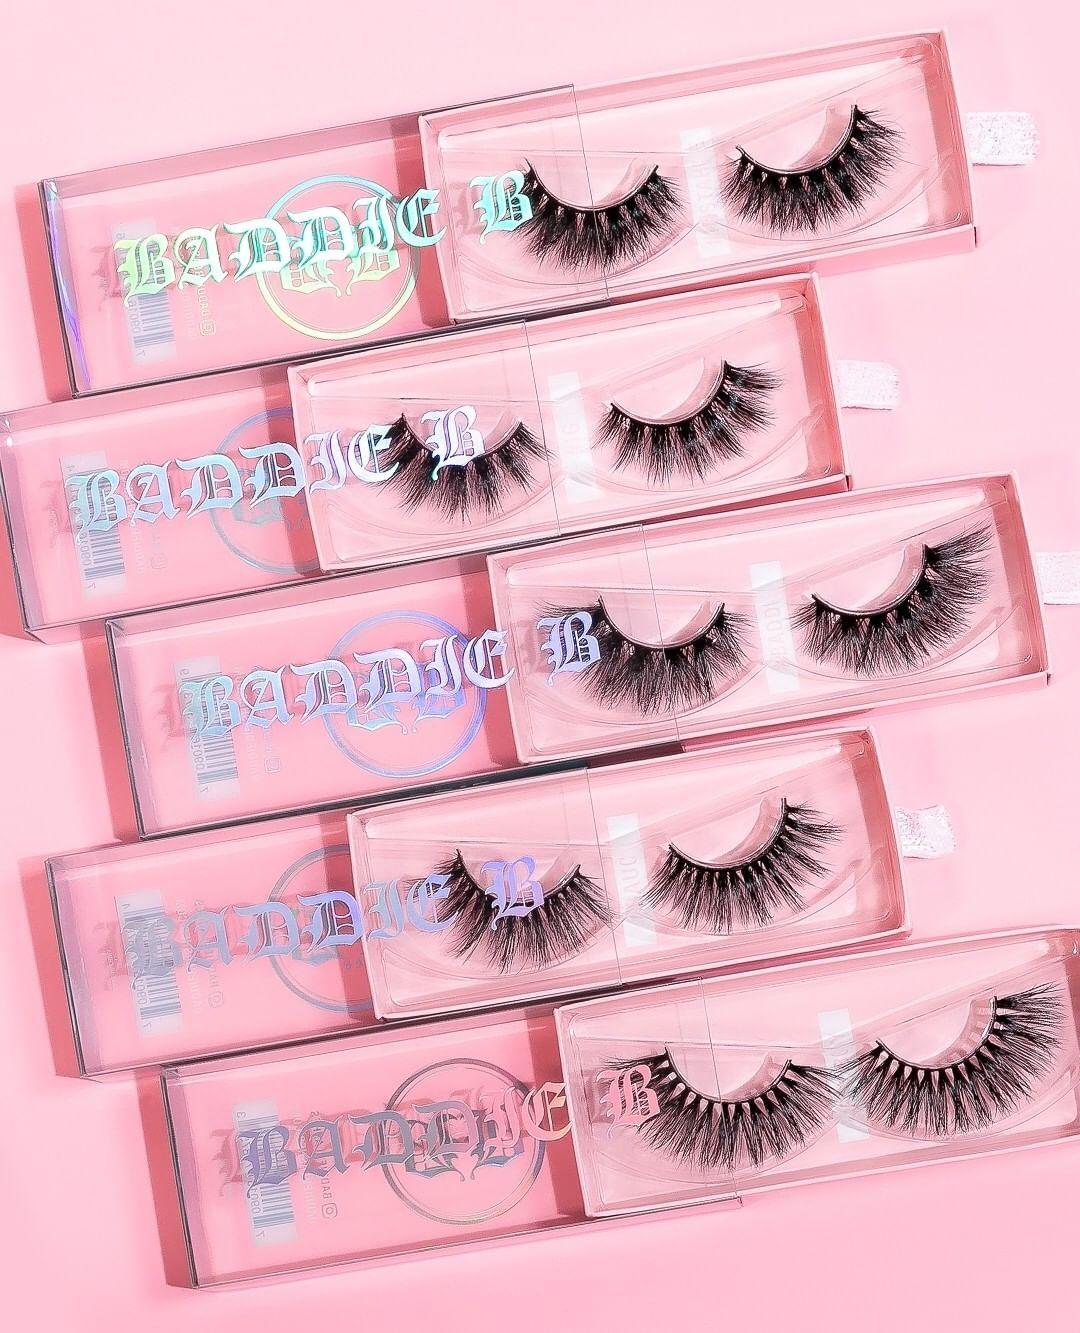 Custom Eyelash Packaging Box Mink Lashes Private Label Manufacturer Eye Lash Packaging Eyelash Brands Mink Lashes